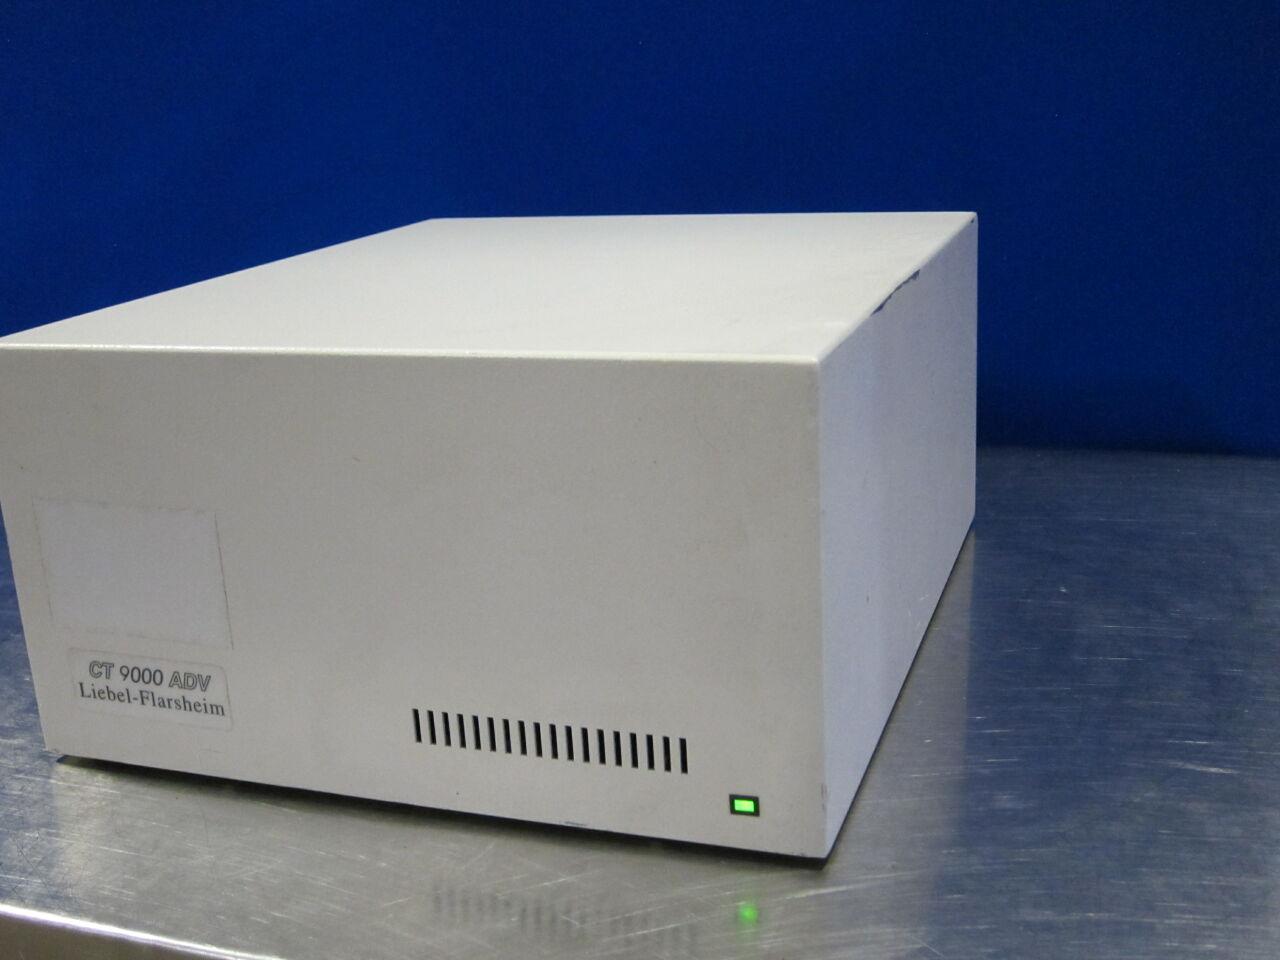 LIEBEL FLARSHEIM CT900 ADV Interior Console Injector CT